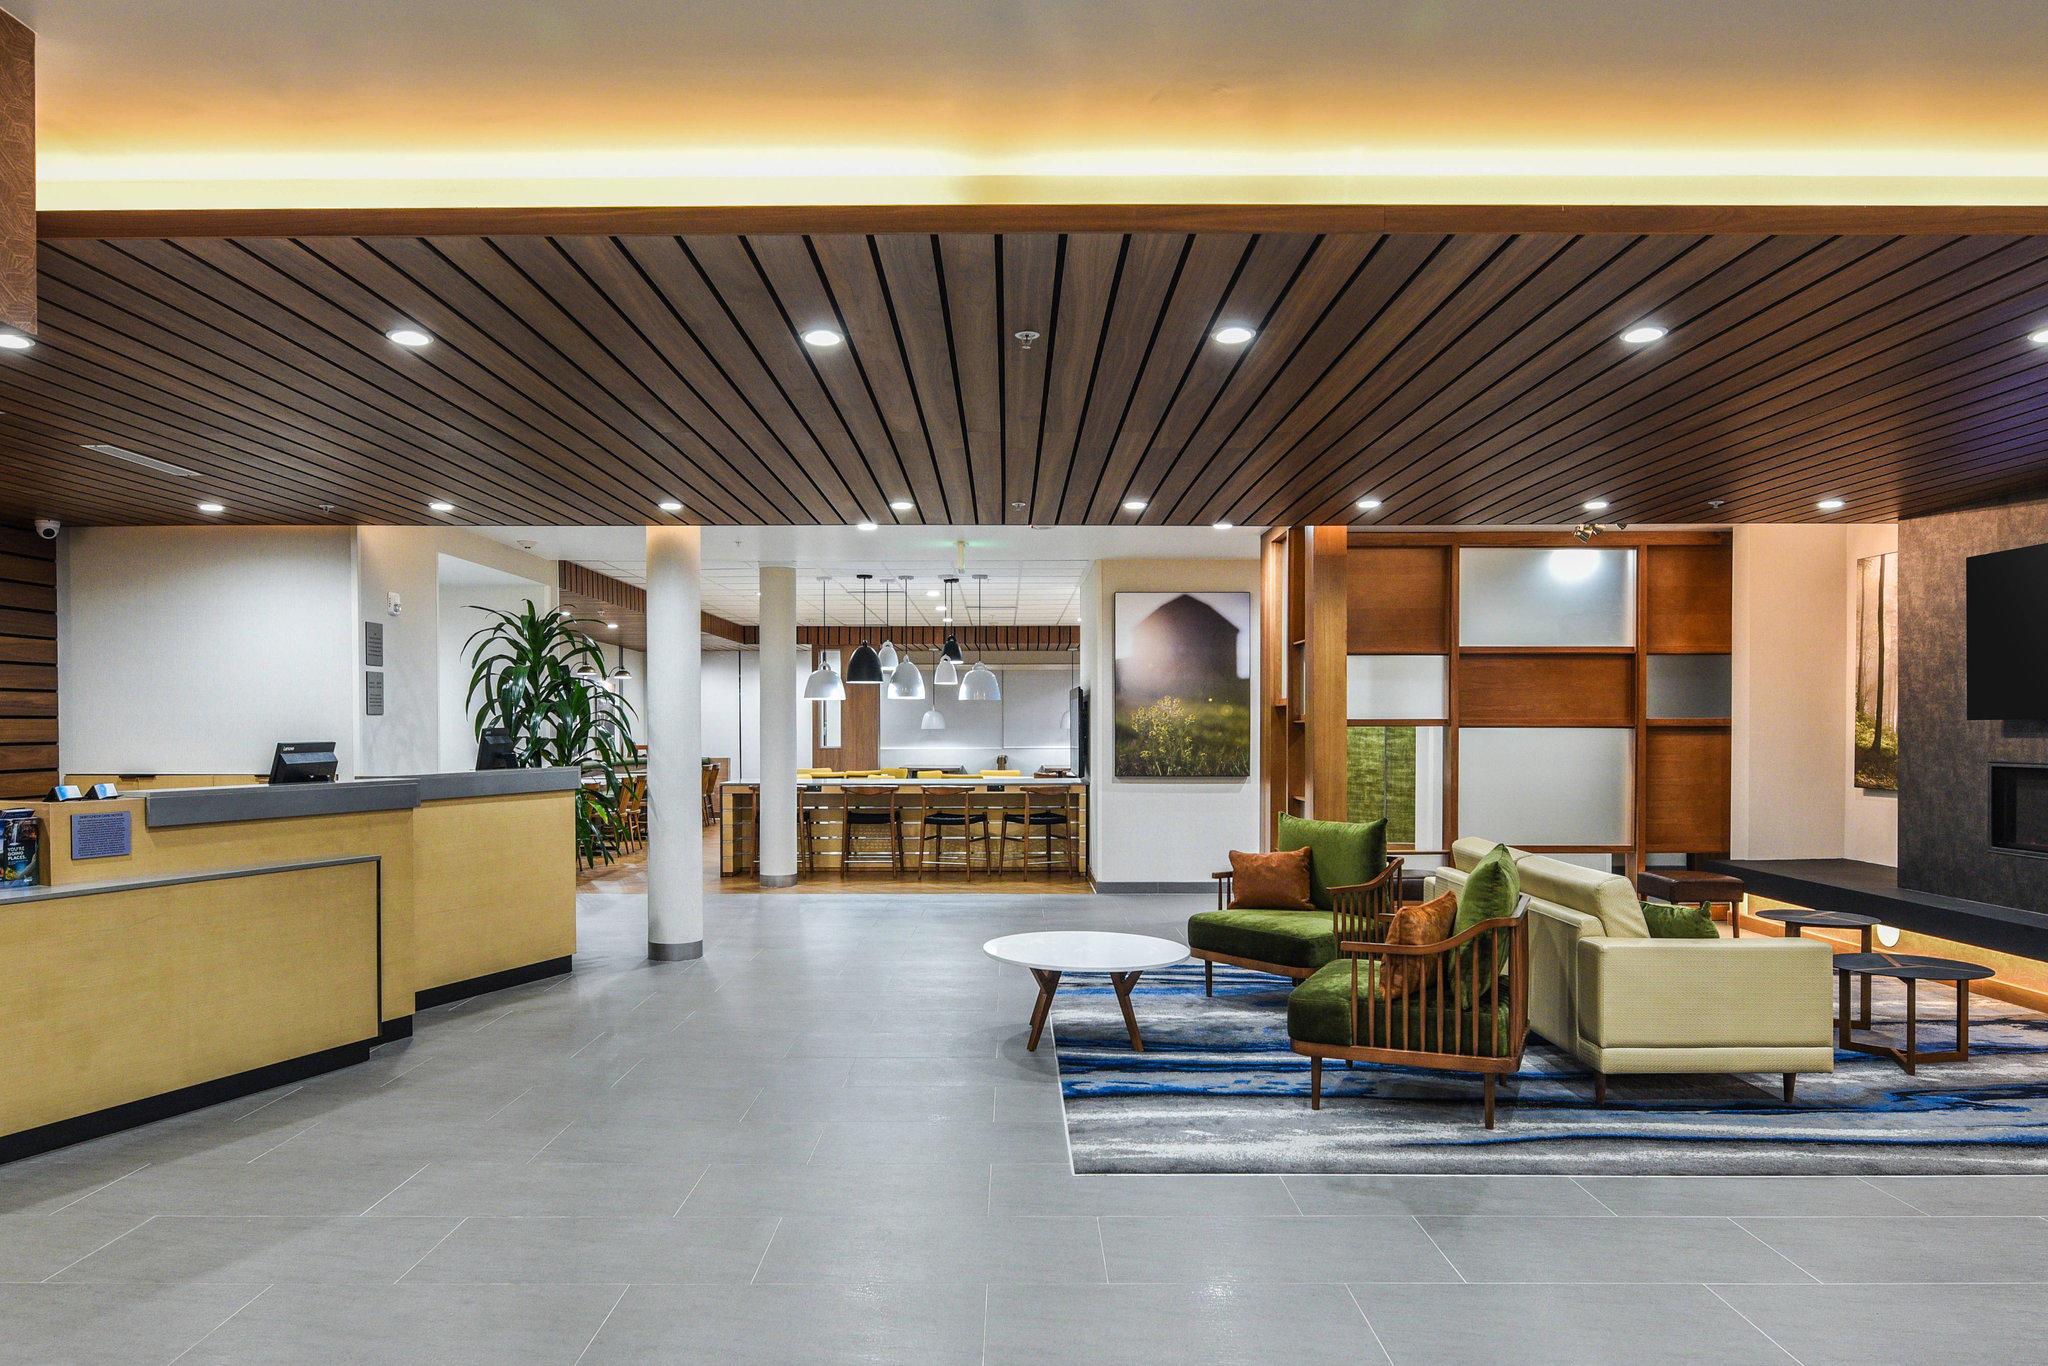 Fairfield Inn & Suites by Marriott Ontario Rancho Cucamonga